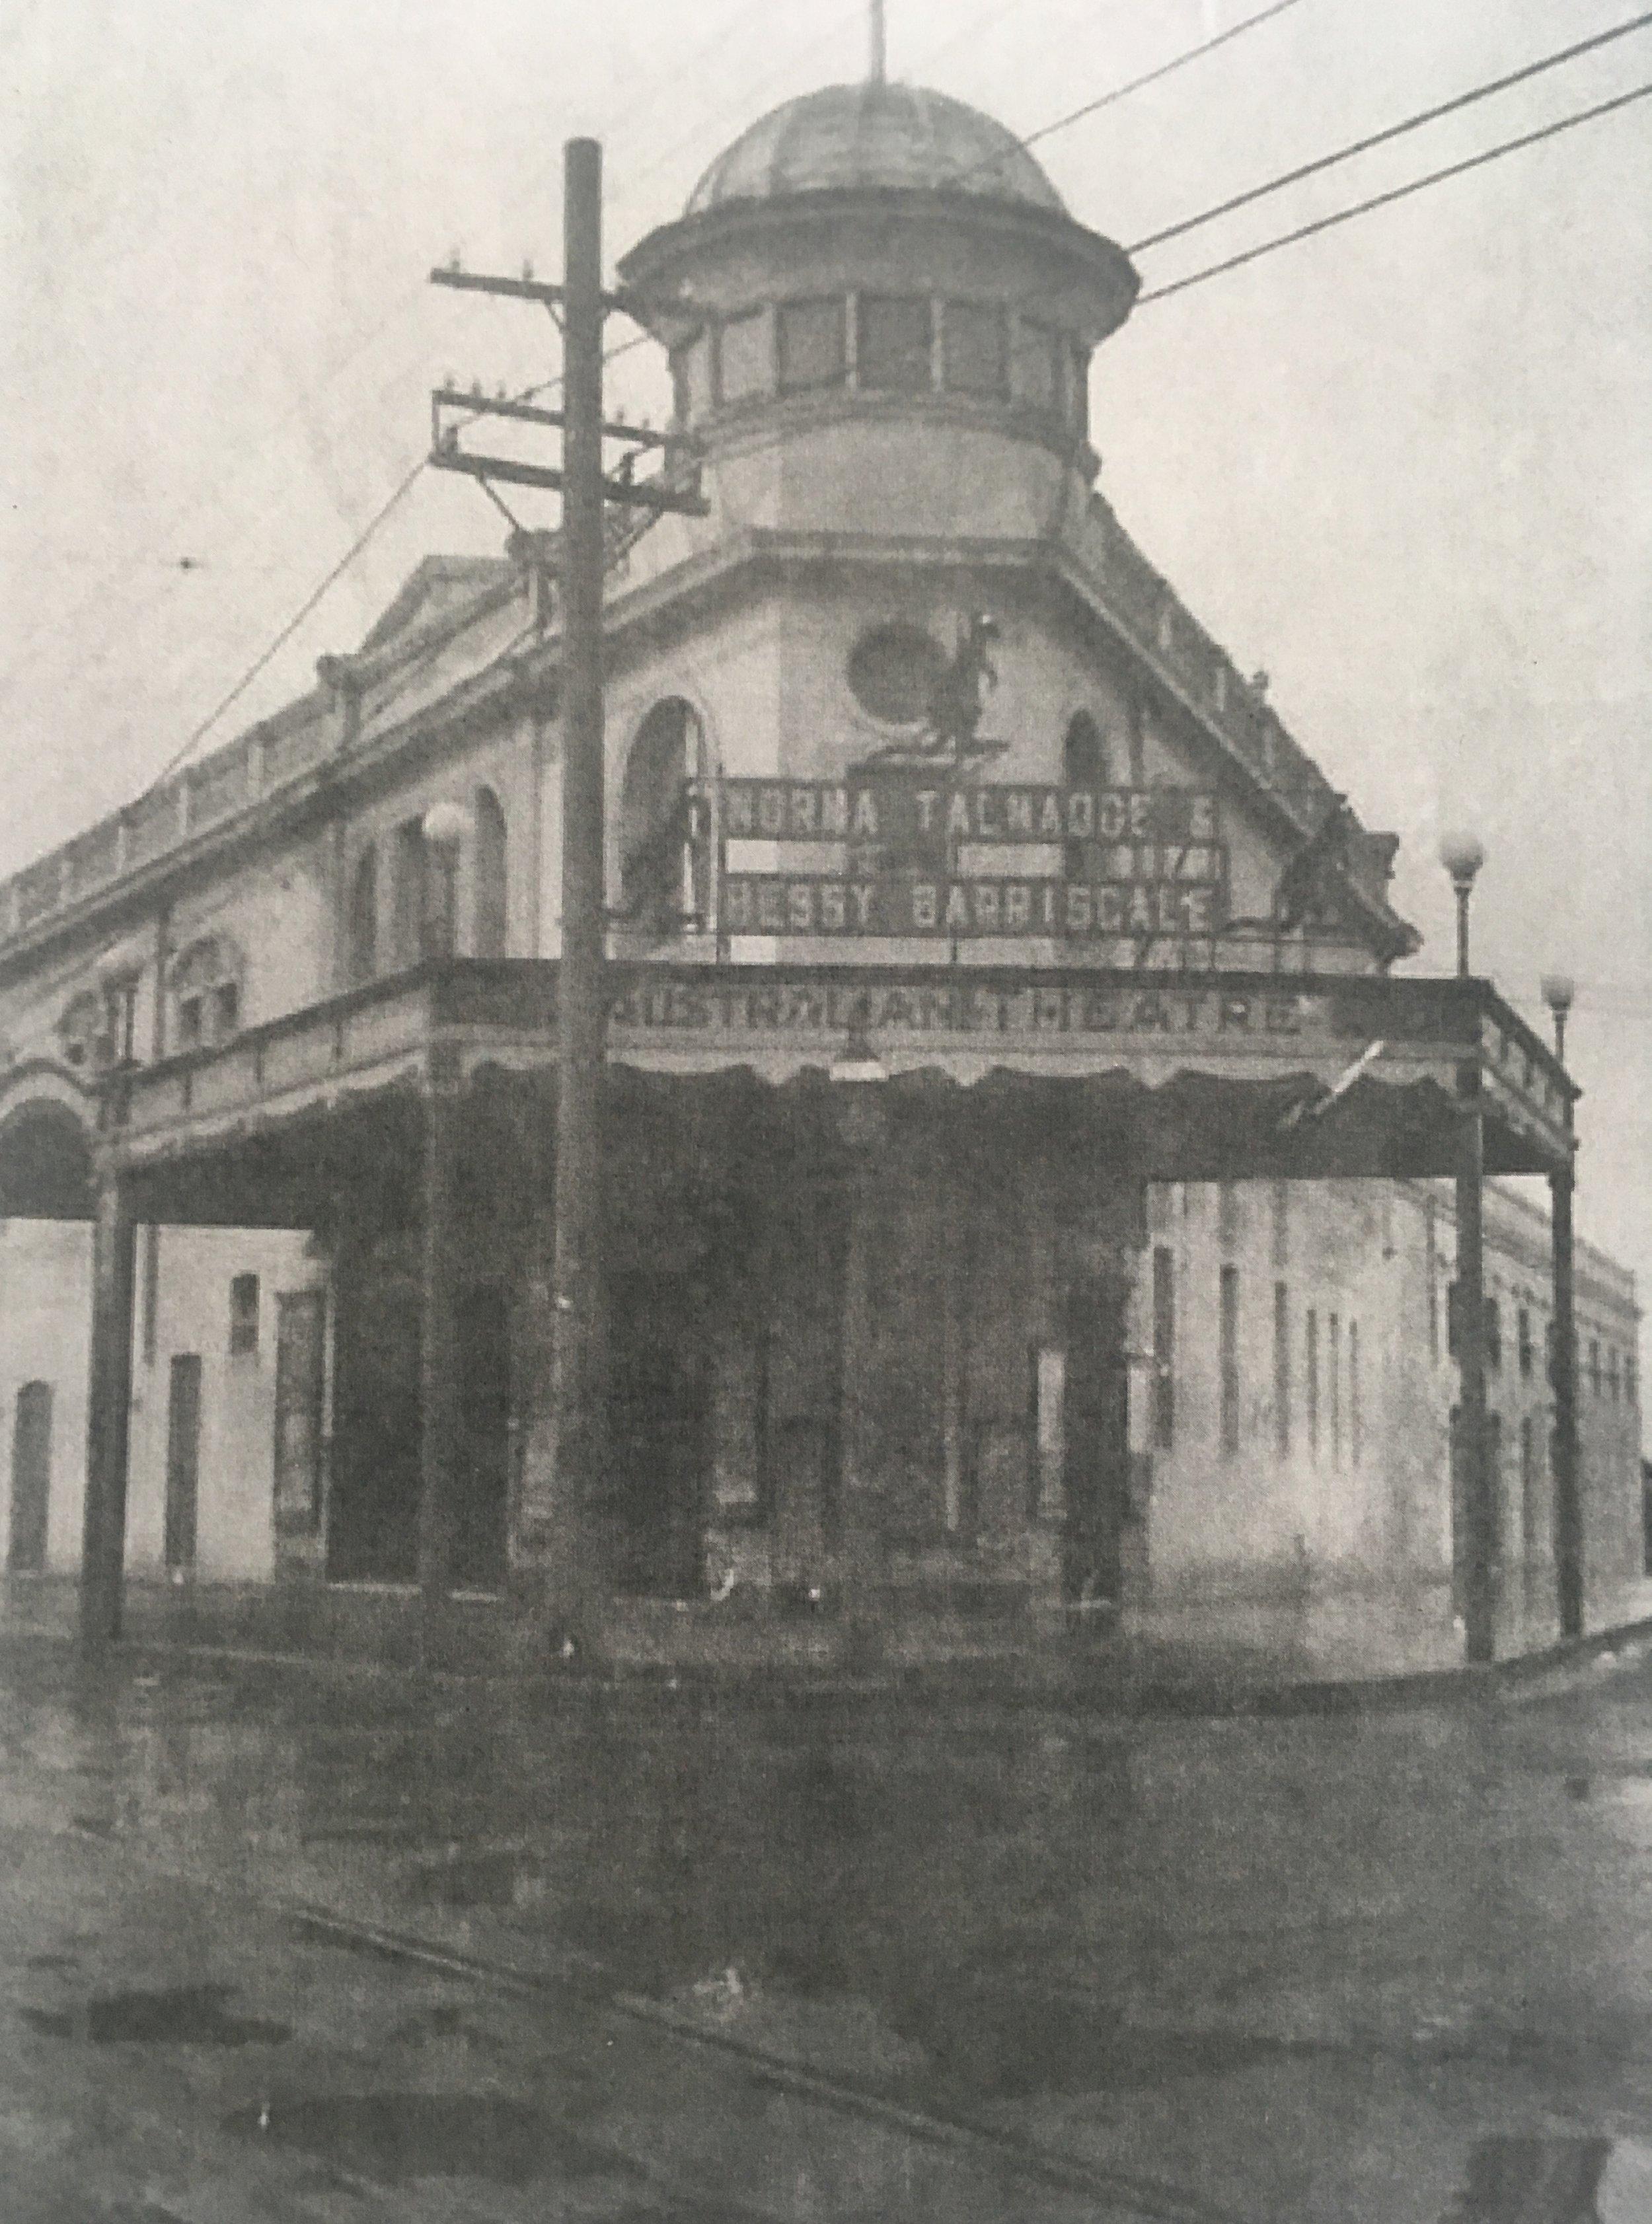 The Australian Theatre opened in Mosman in 1913.